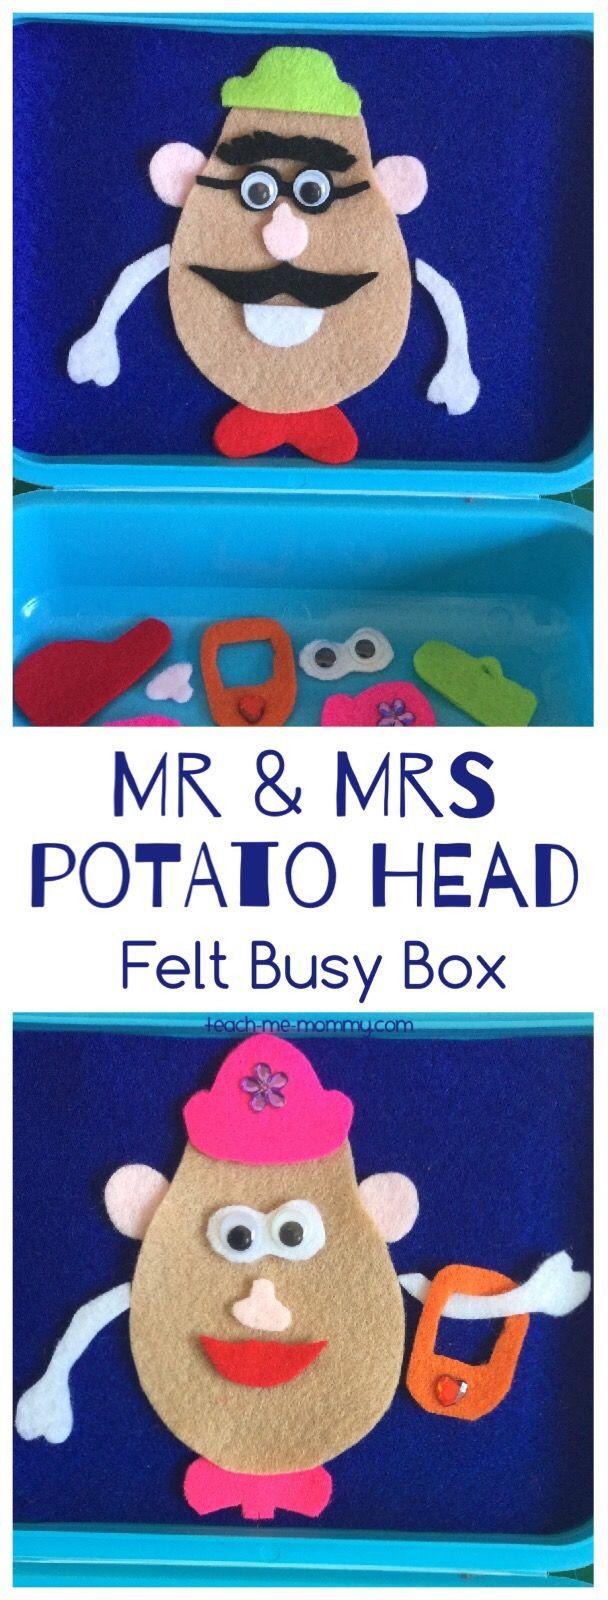 Potato Head Felt Busy Box Make this felt Mr & Mrs Potato Head busy box for hours of fun on the go! #mrpotatohead